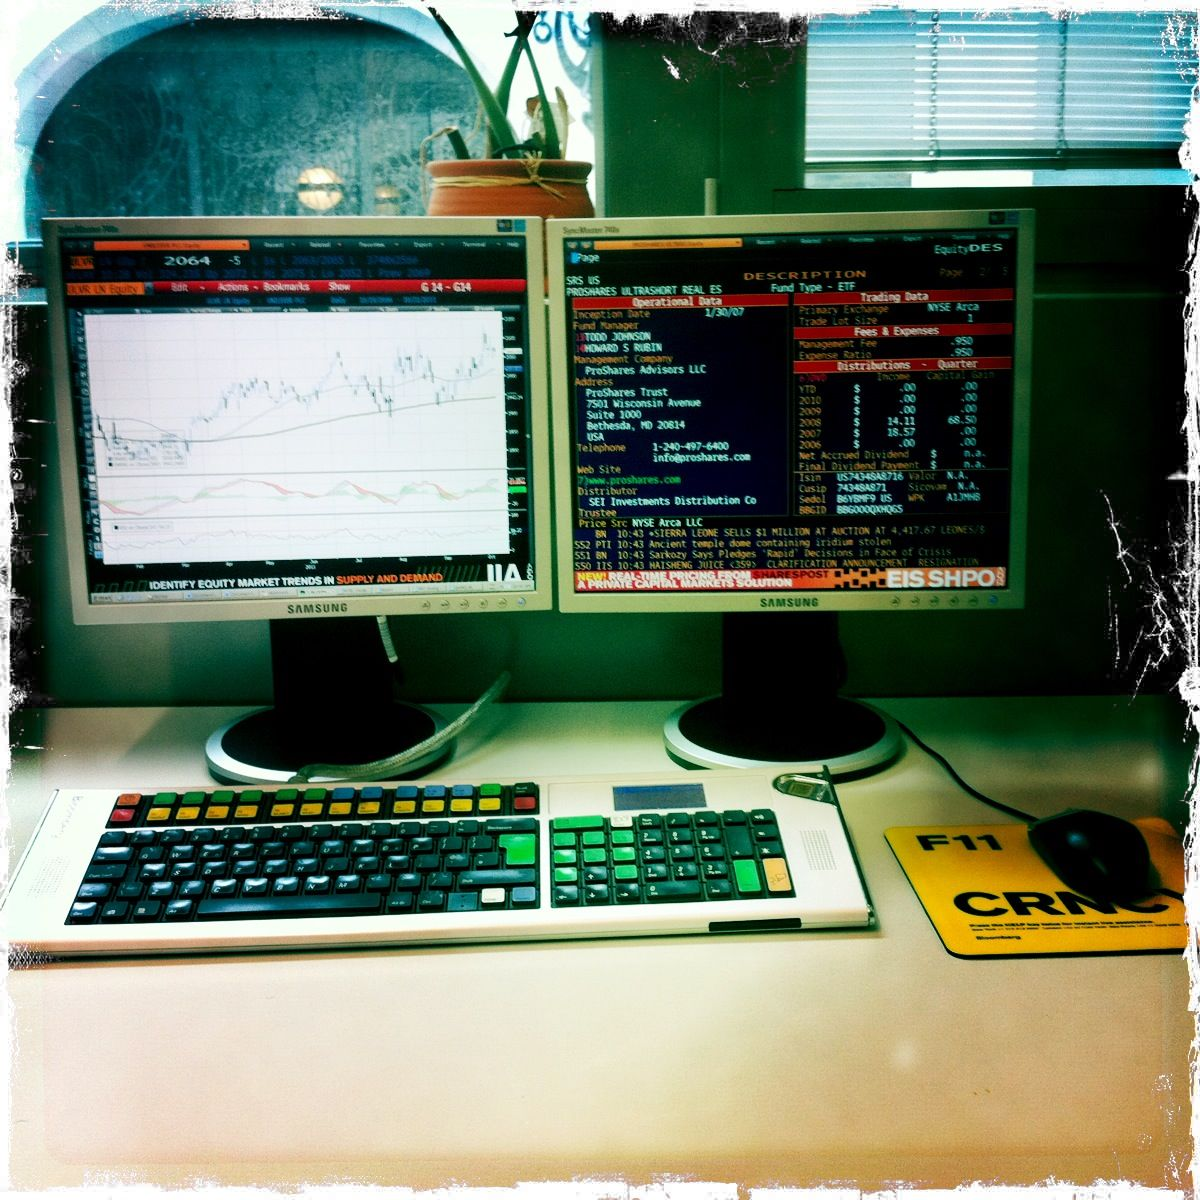 Photo 2011.10.21. 10 44 05.jpg